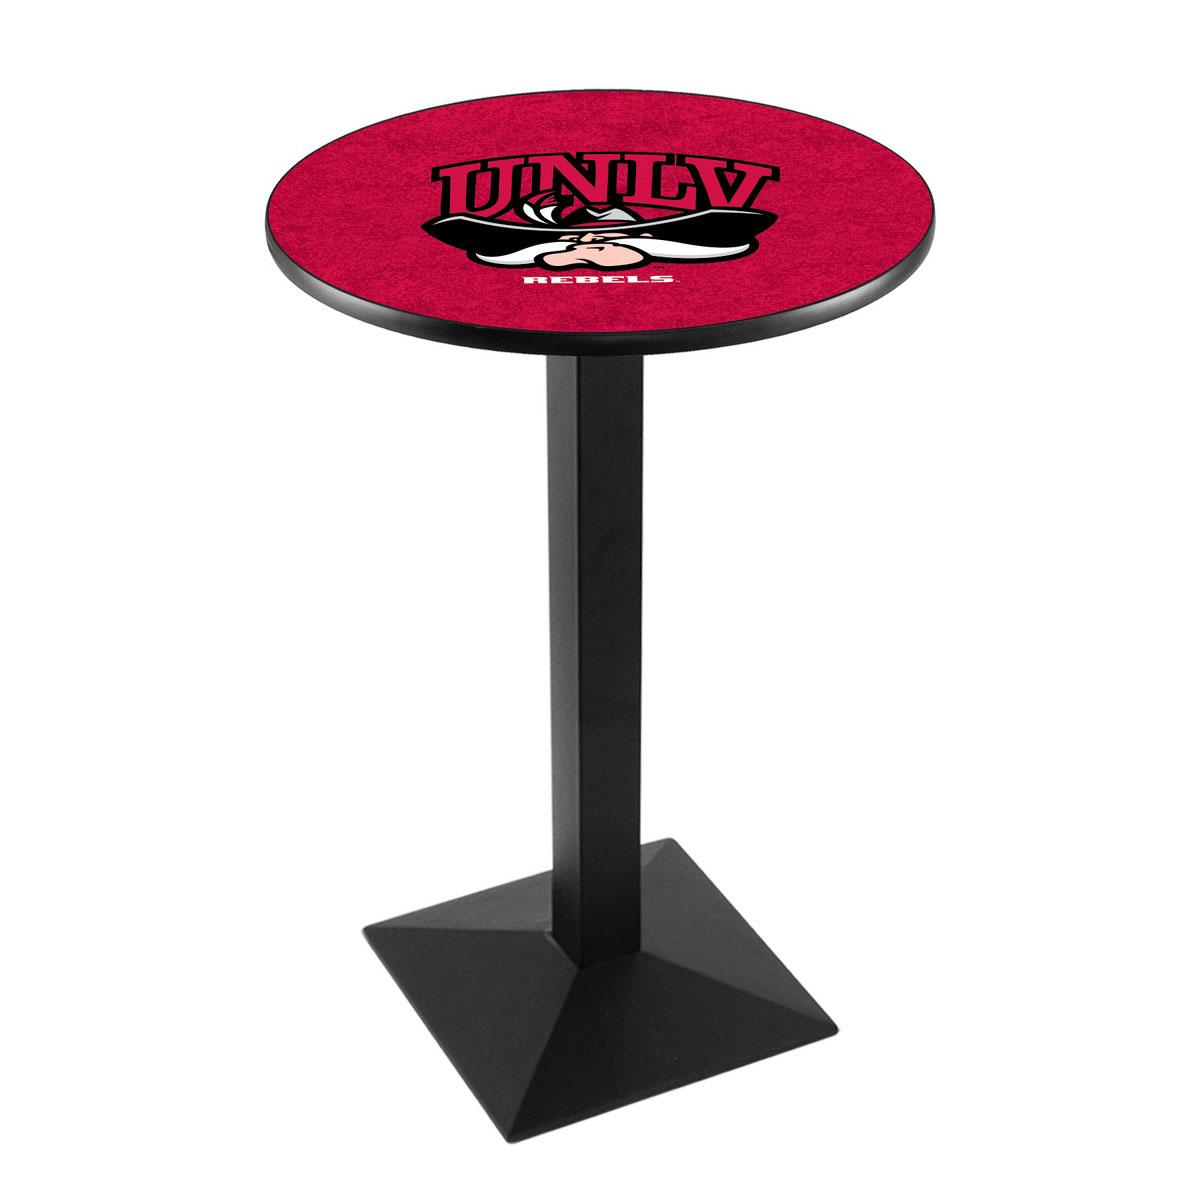 Special University Nevada Las Vegas Logo Pub Bar Table Square Stand Product Photo